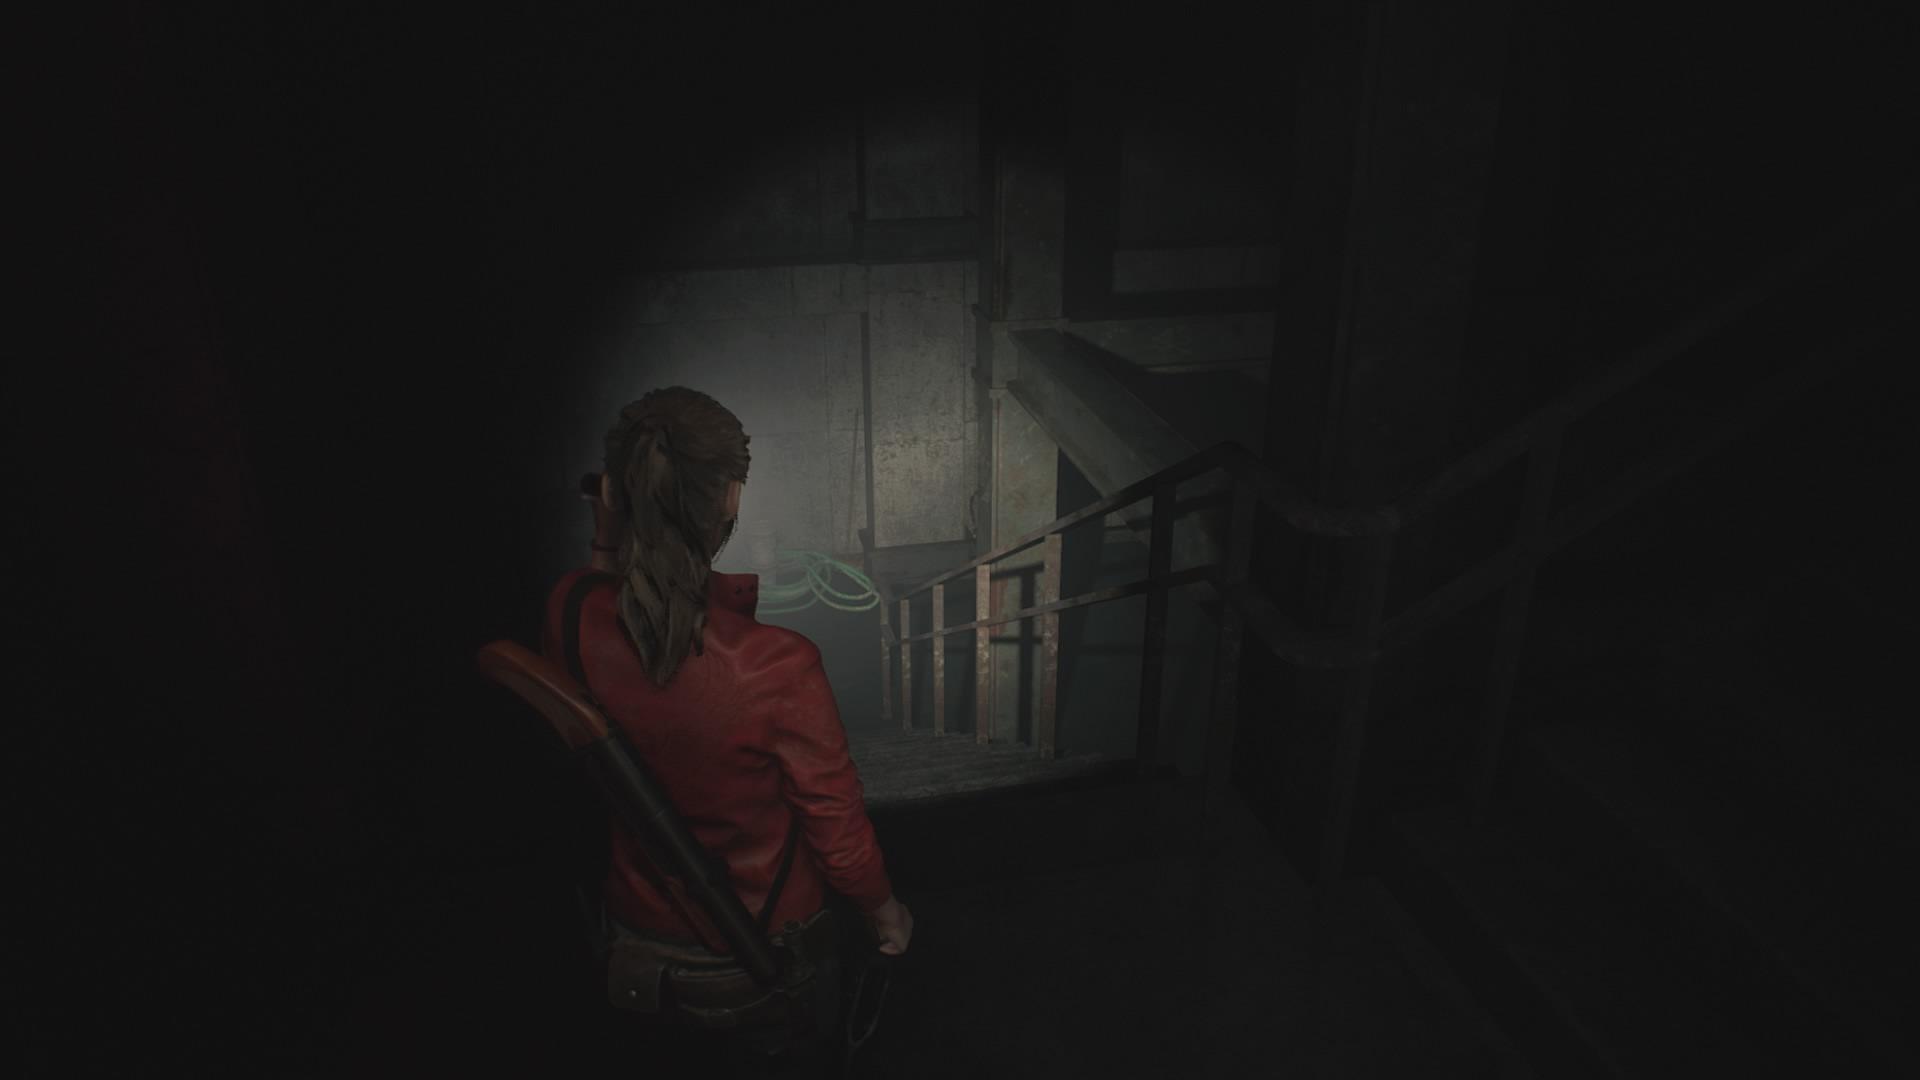 Escaleras subterráneas